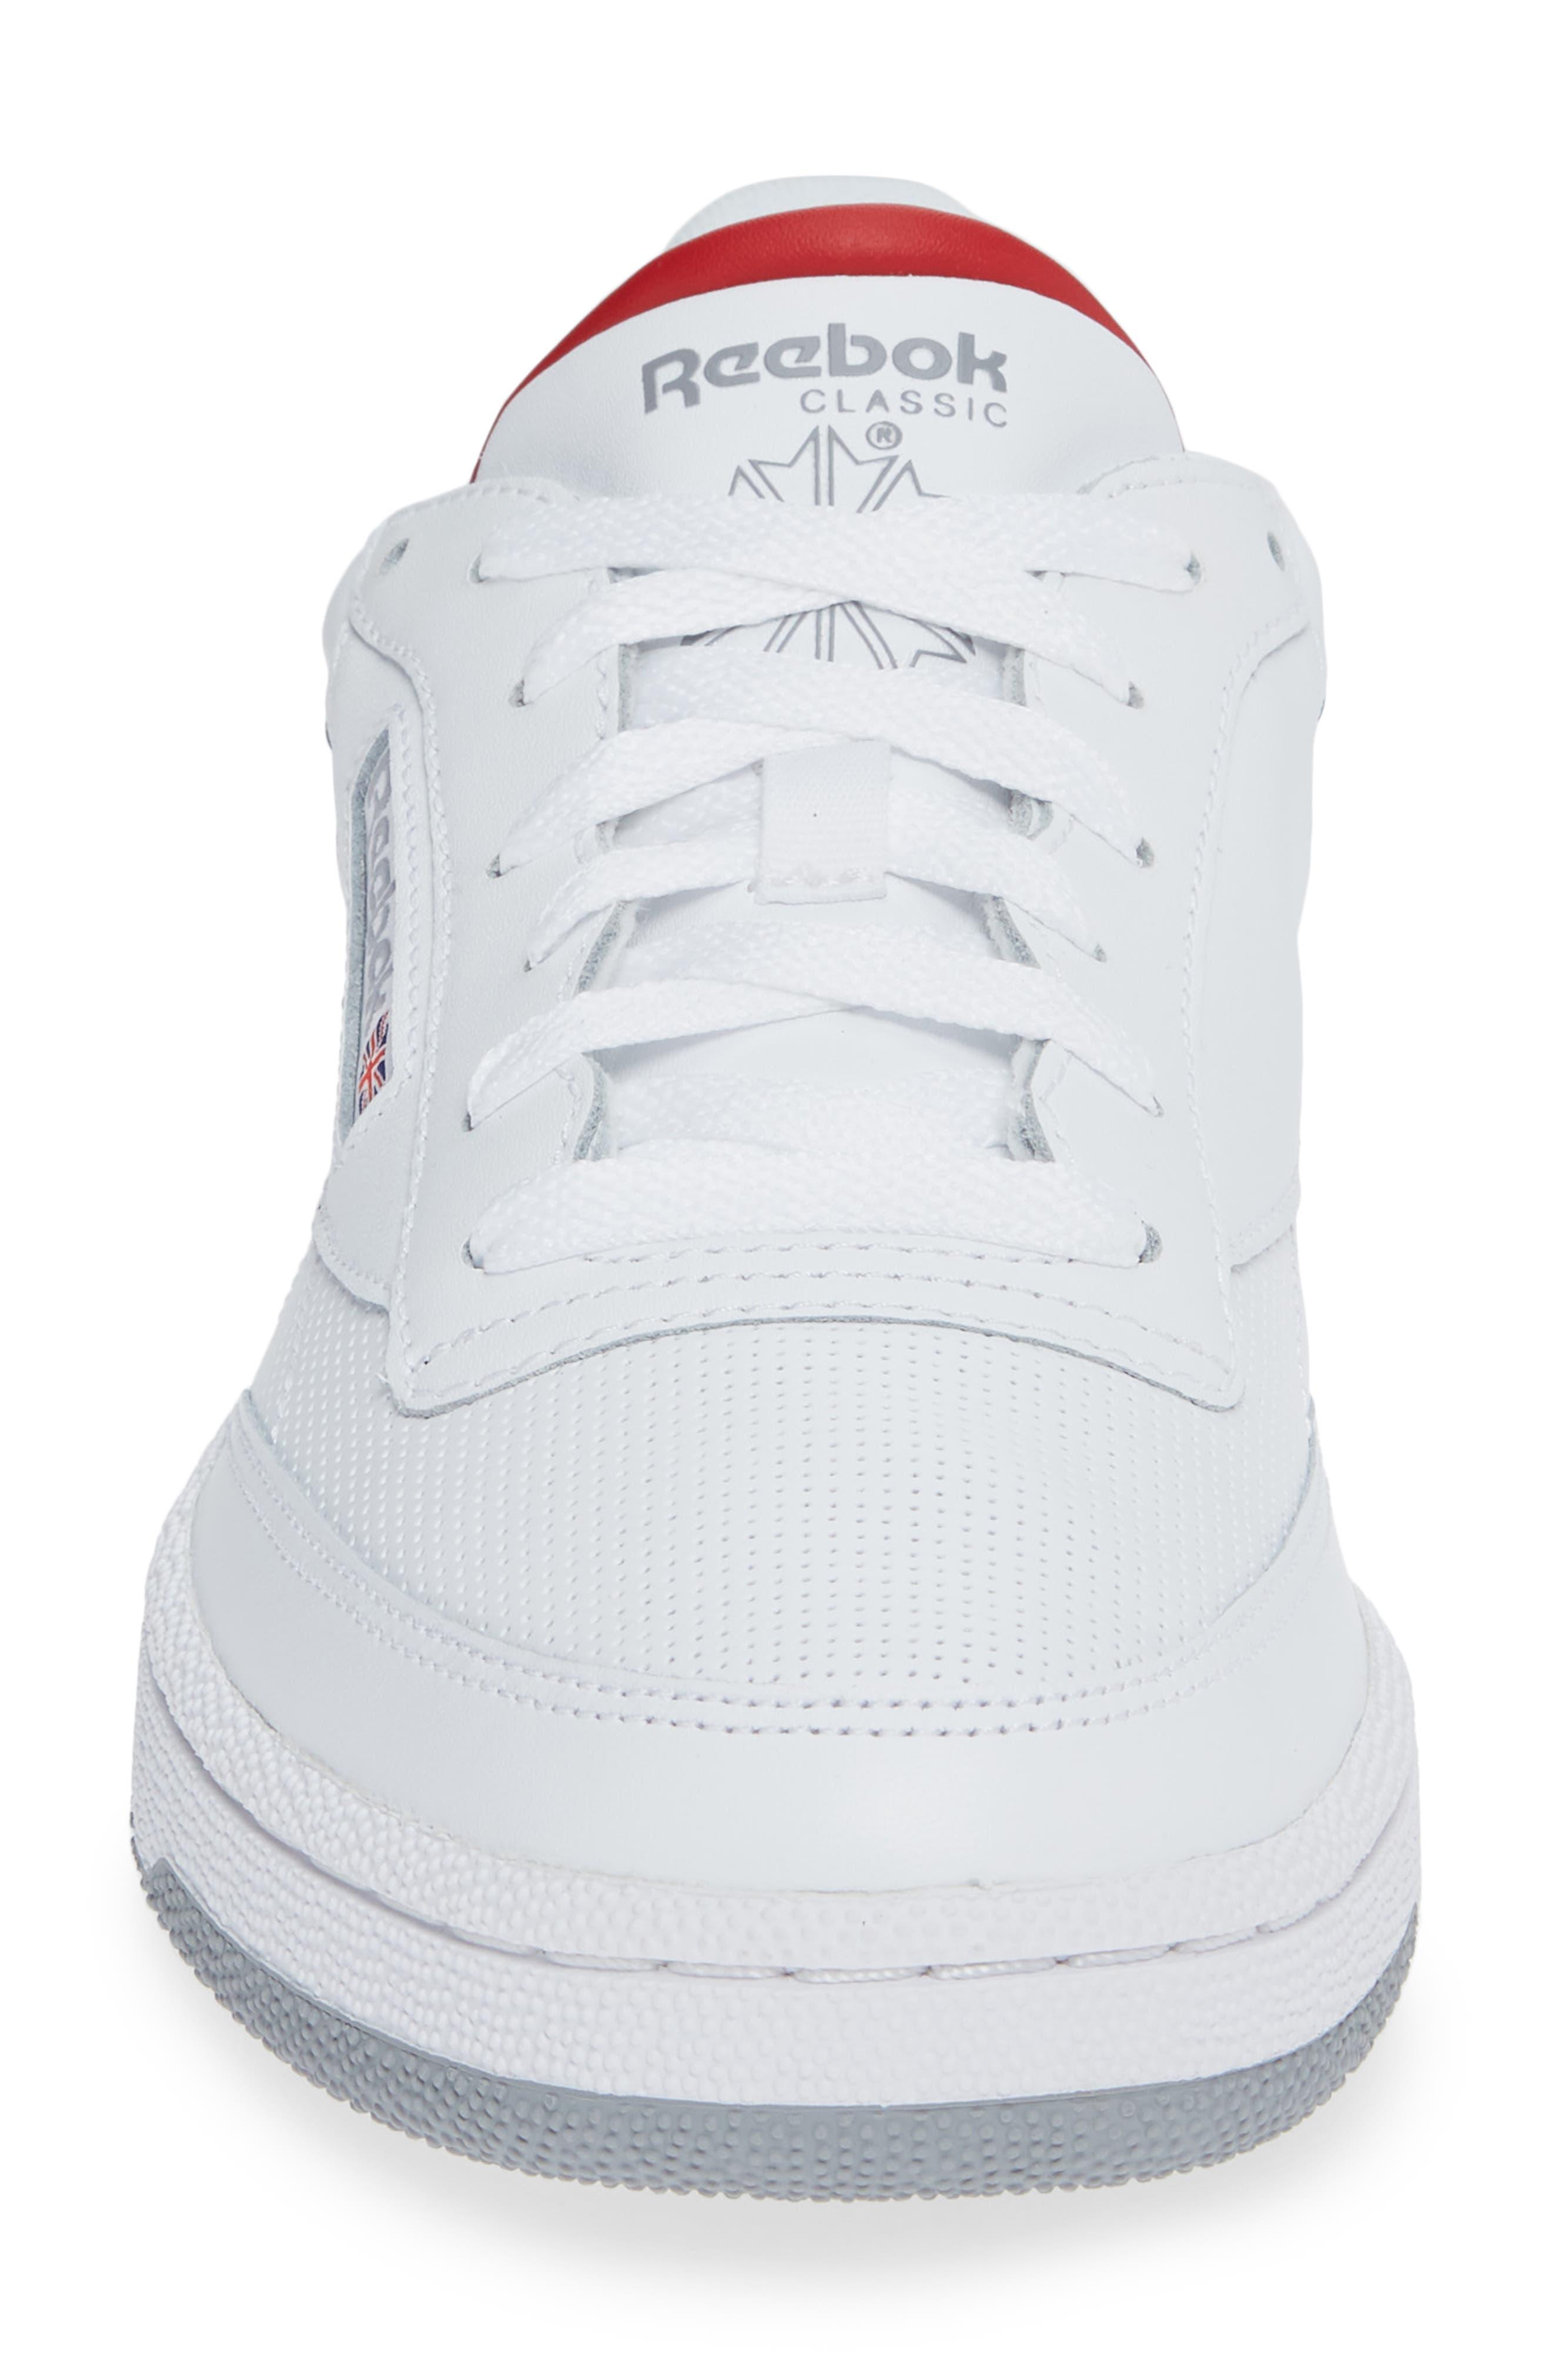 Club C 85 Sneaker,                             Alternate thumbnail 4, color,                             WHITE/ COLLEGIATE NAVY/ RED